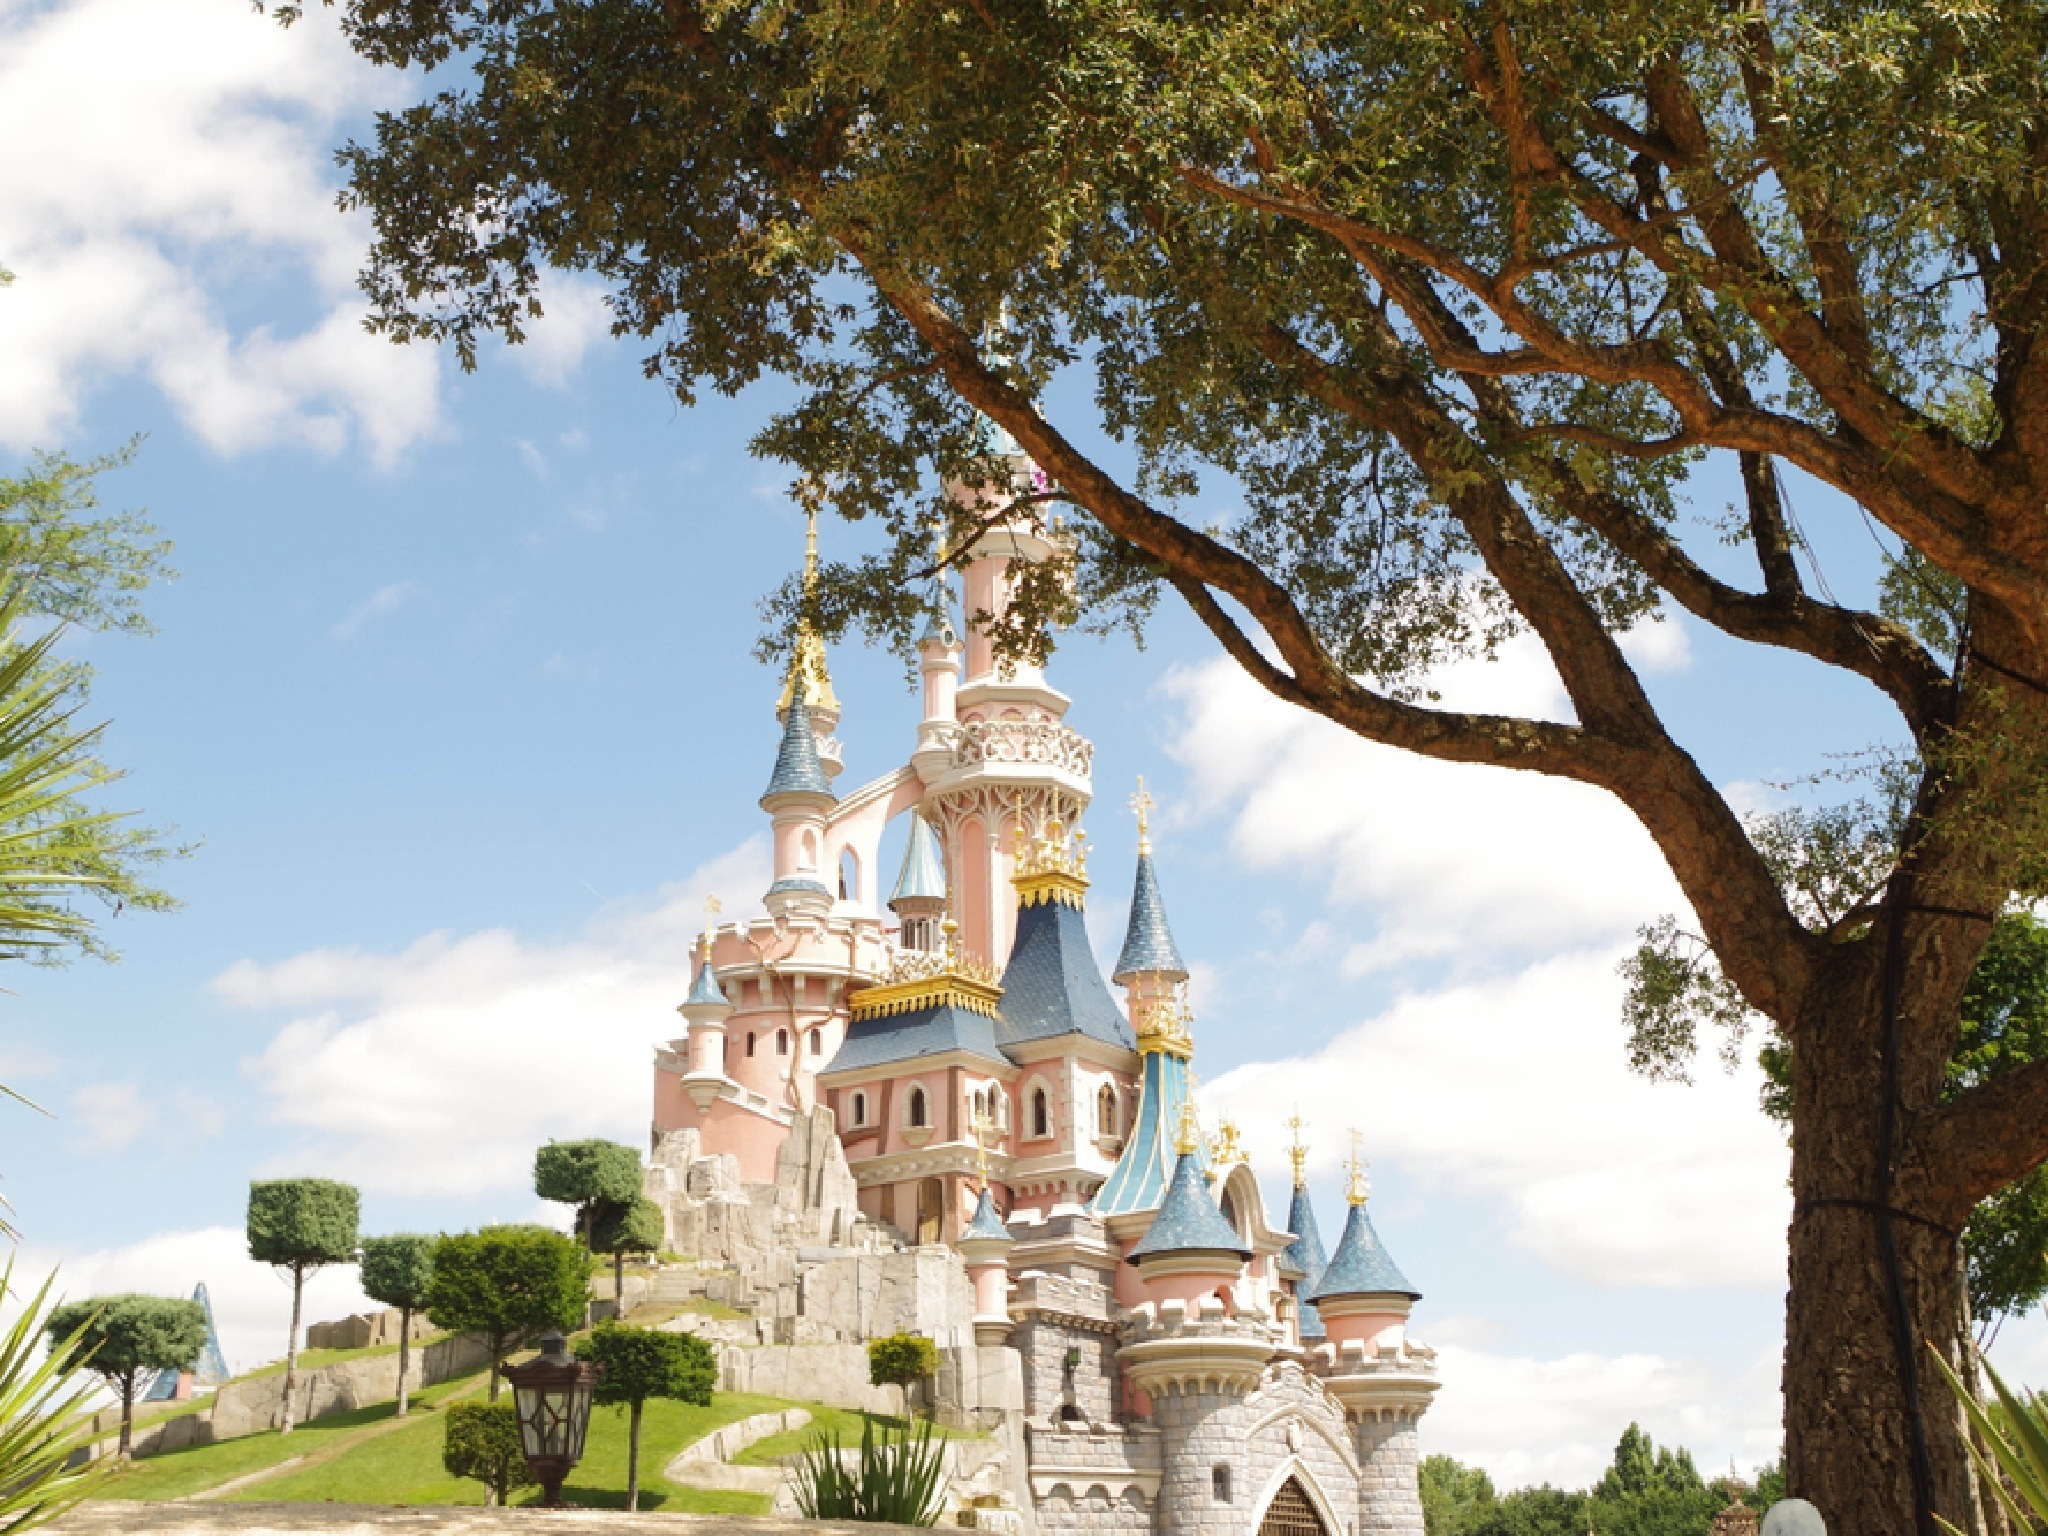 Disneyland Paris finally has a reopening date